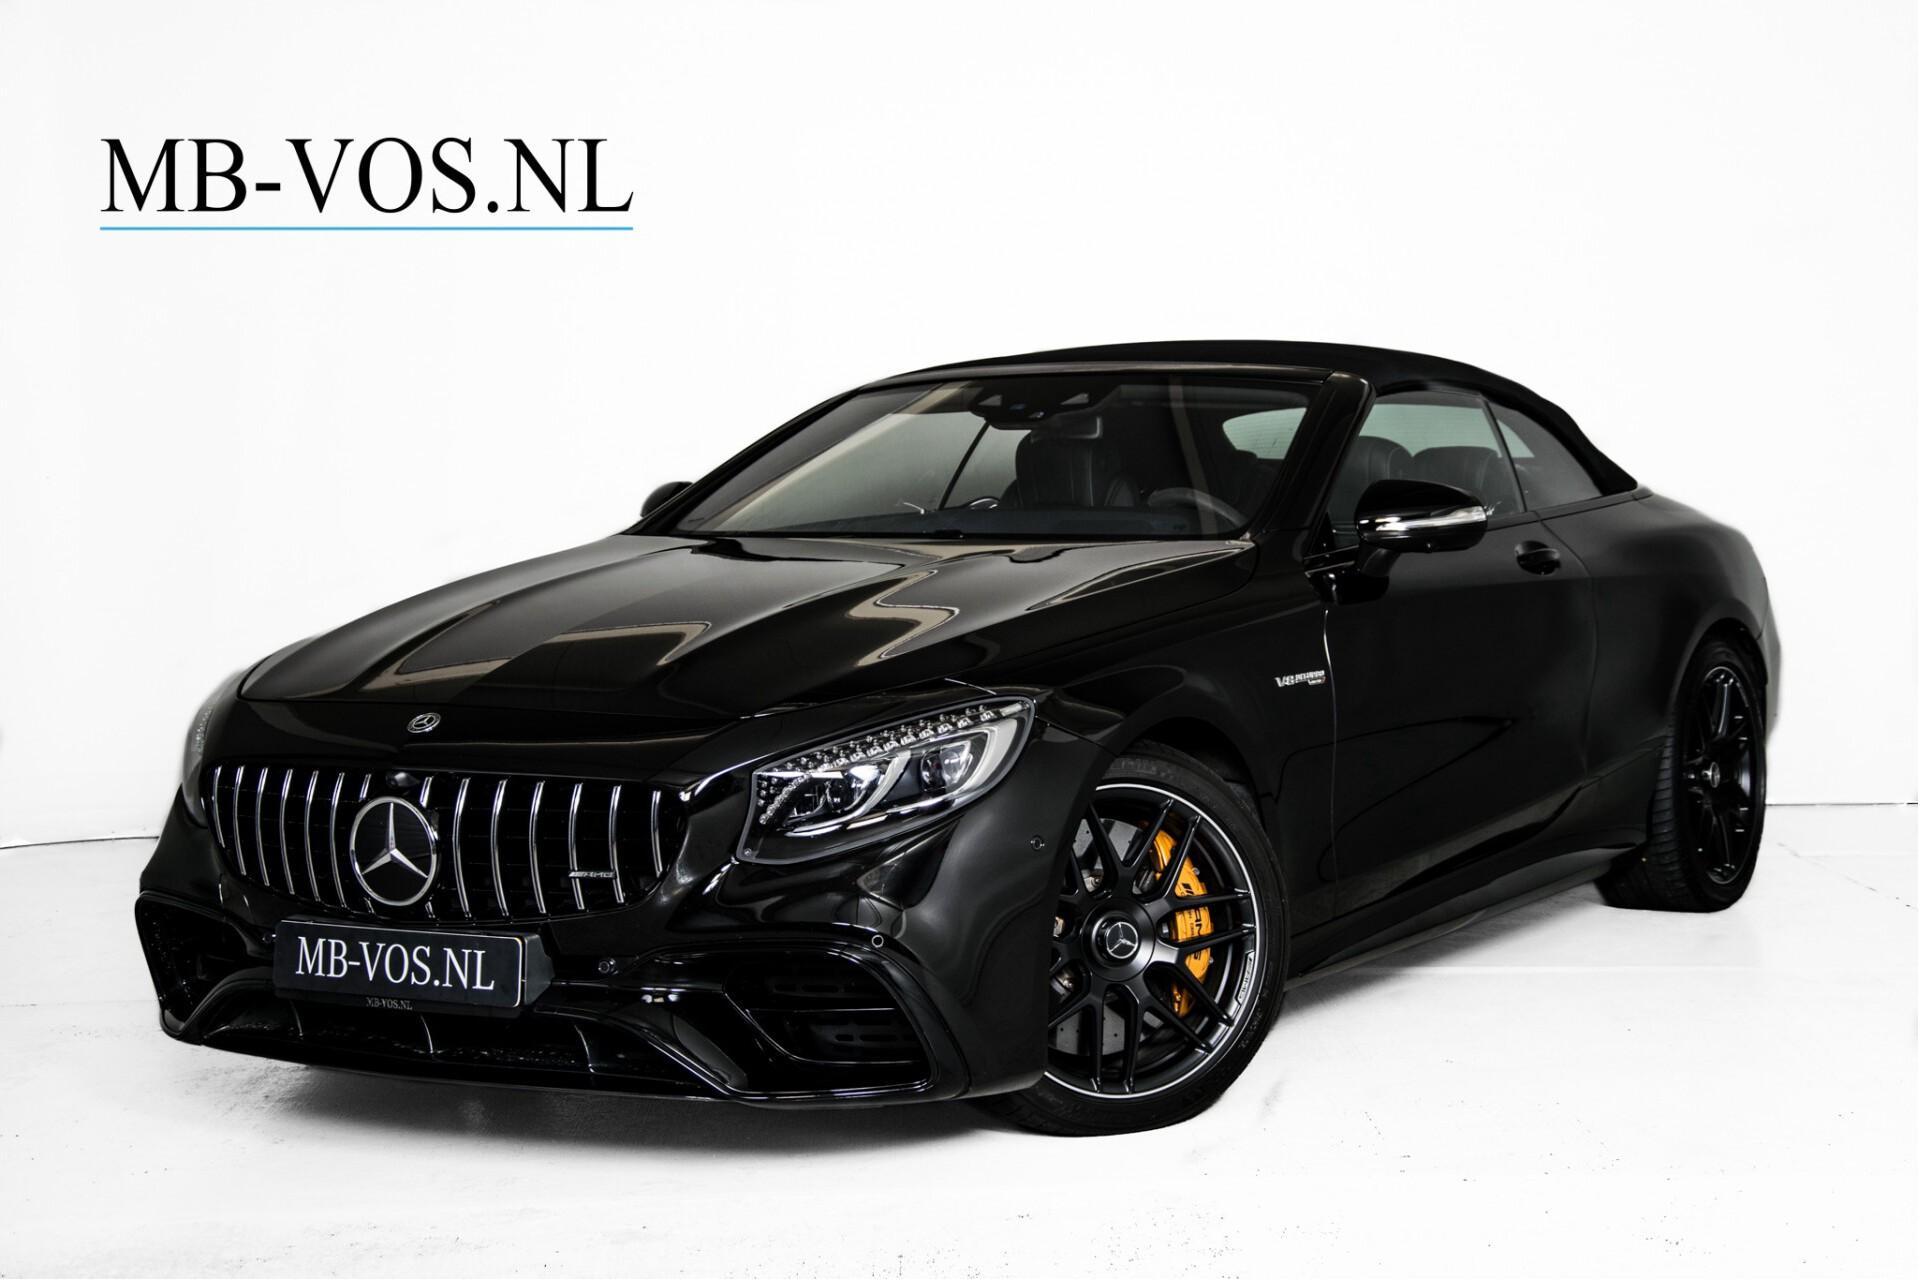 Mercedes-Benz S-Klasse Cabrio 63 AMG 4M+ Keramisch/Burmester High End 3D/Carbon/Driverspack/Blackpack Aut9 Foto 2